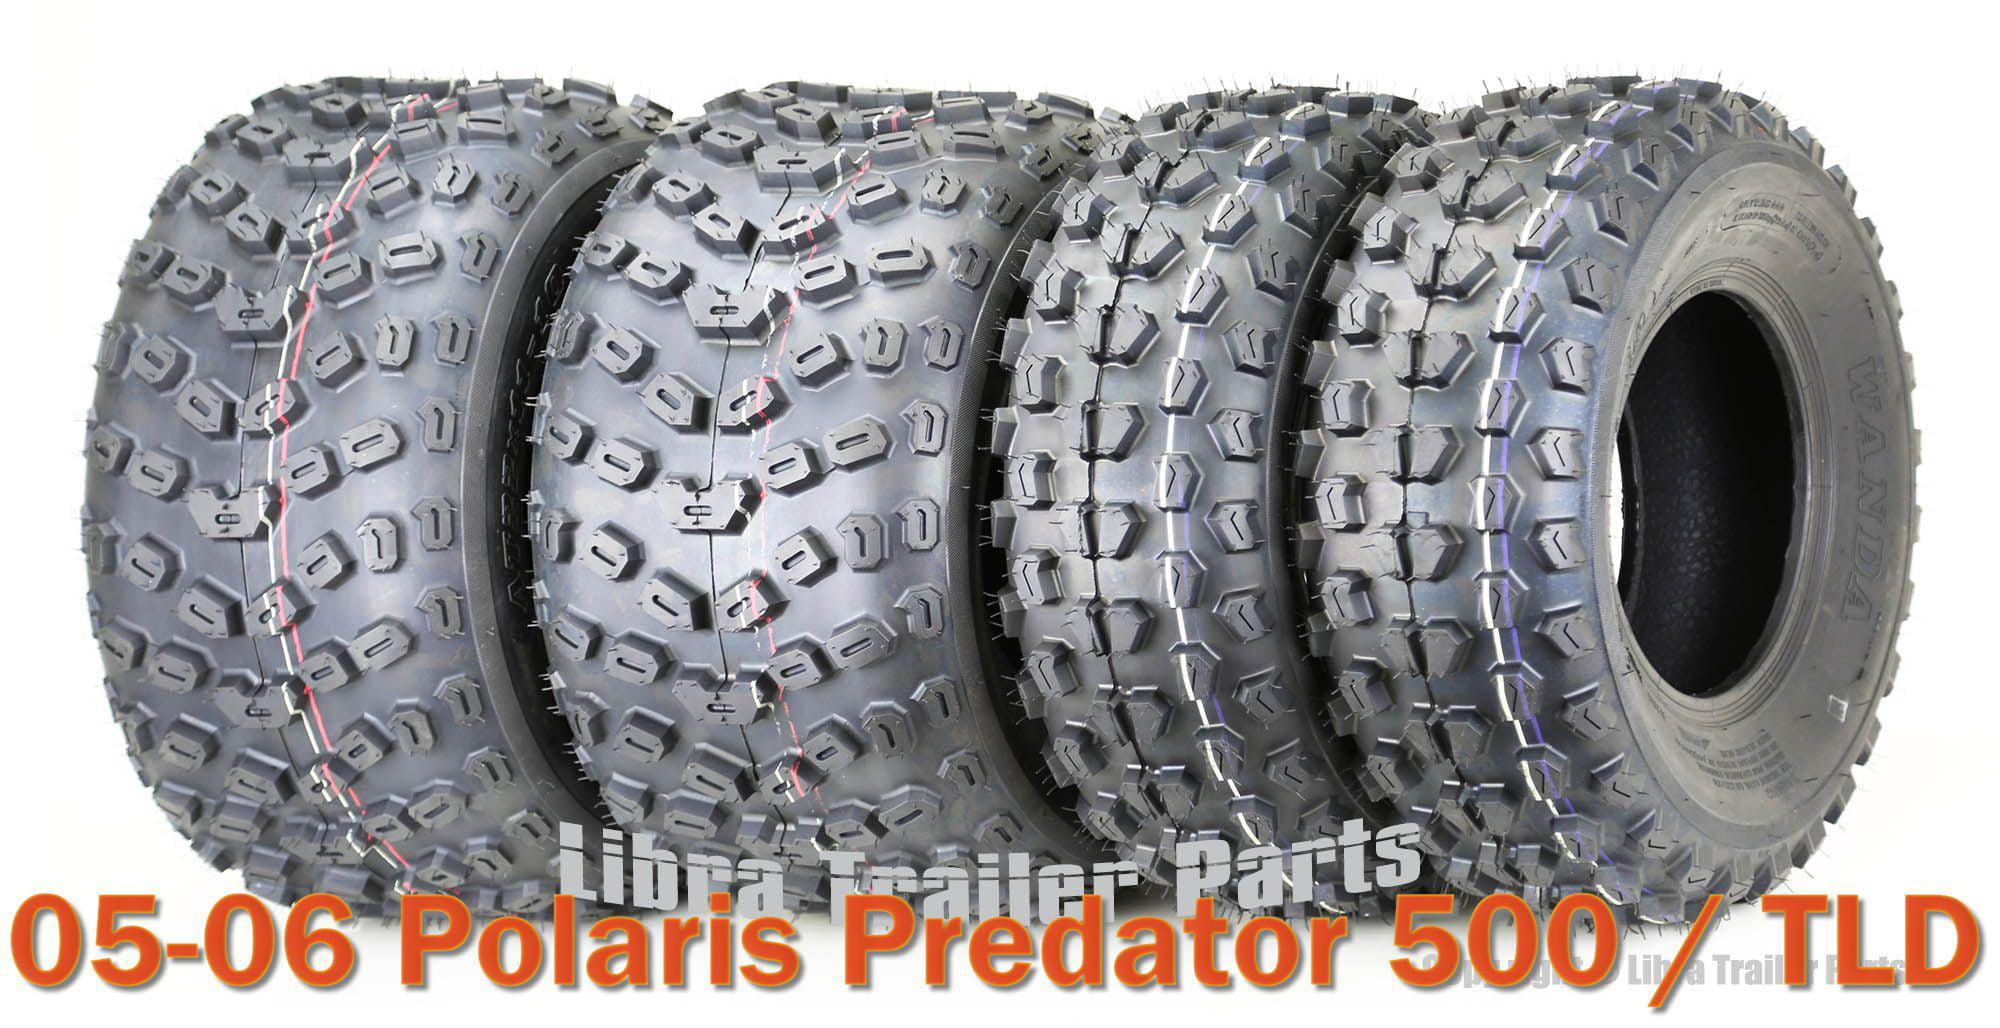 Tread Depth .5in.~2005 Polaris Predator 500 Trail Wolf Front Tire 21x7x10